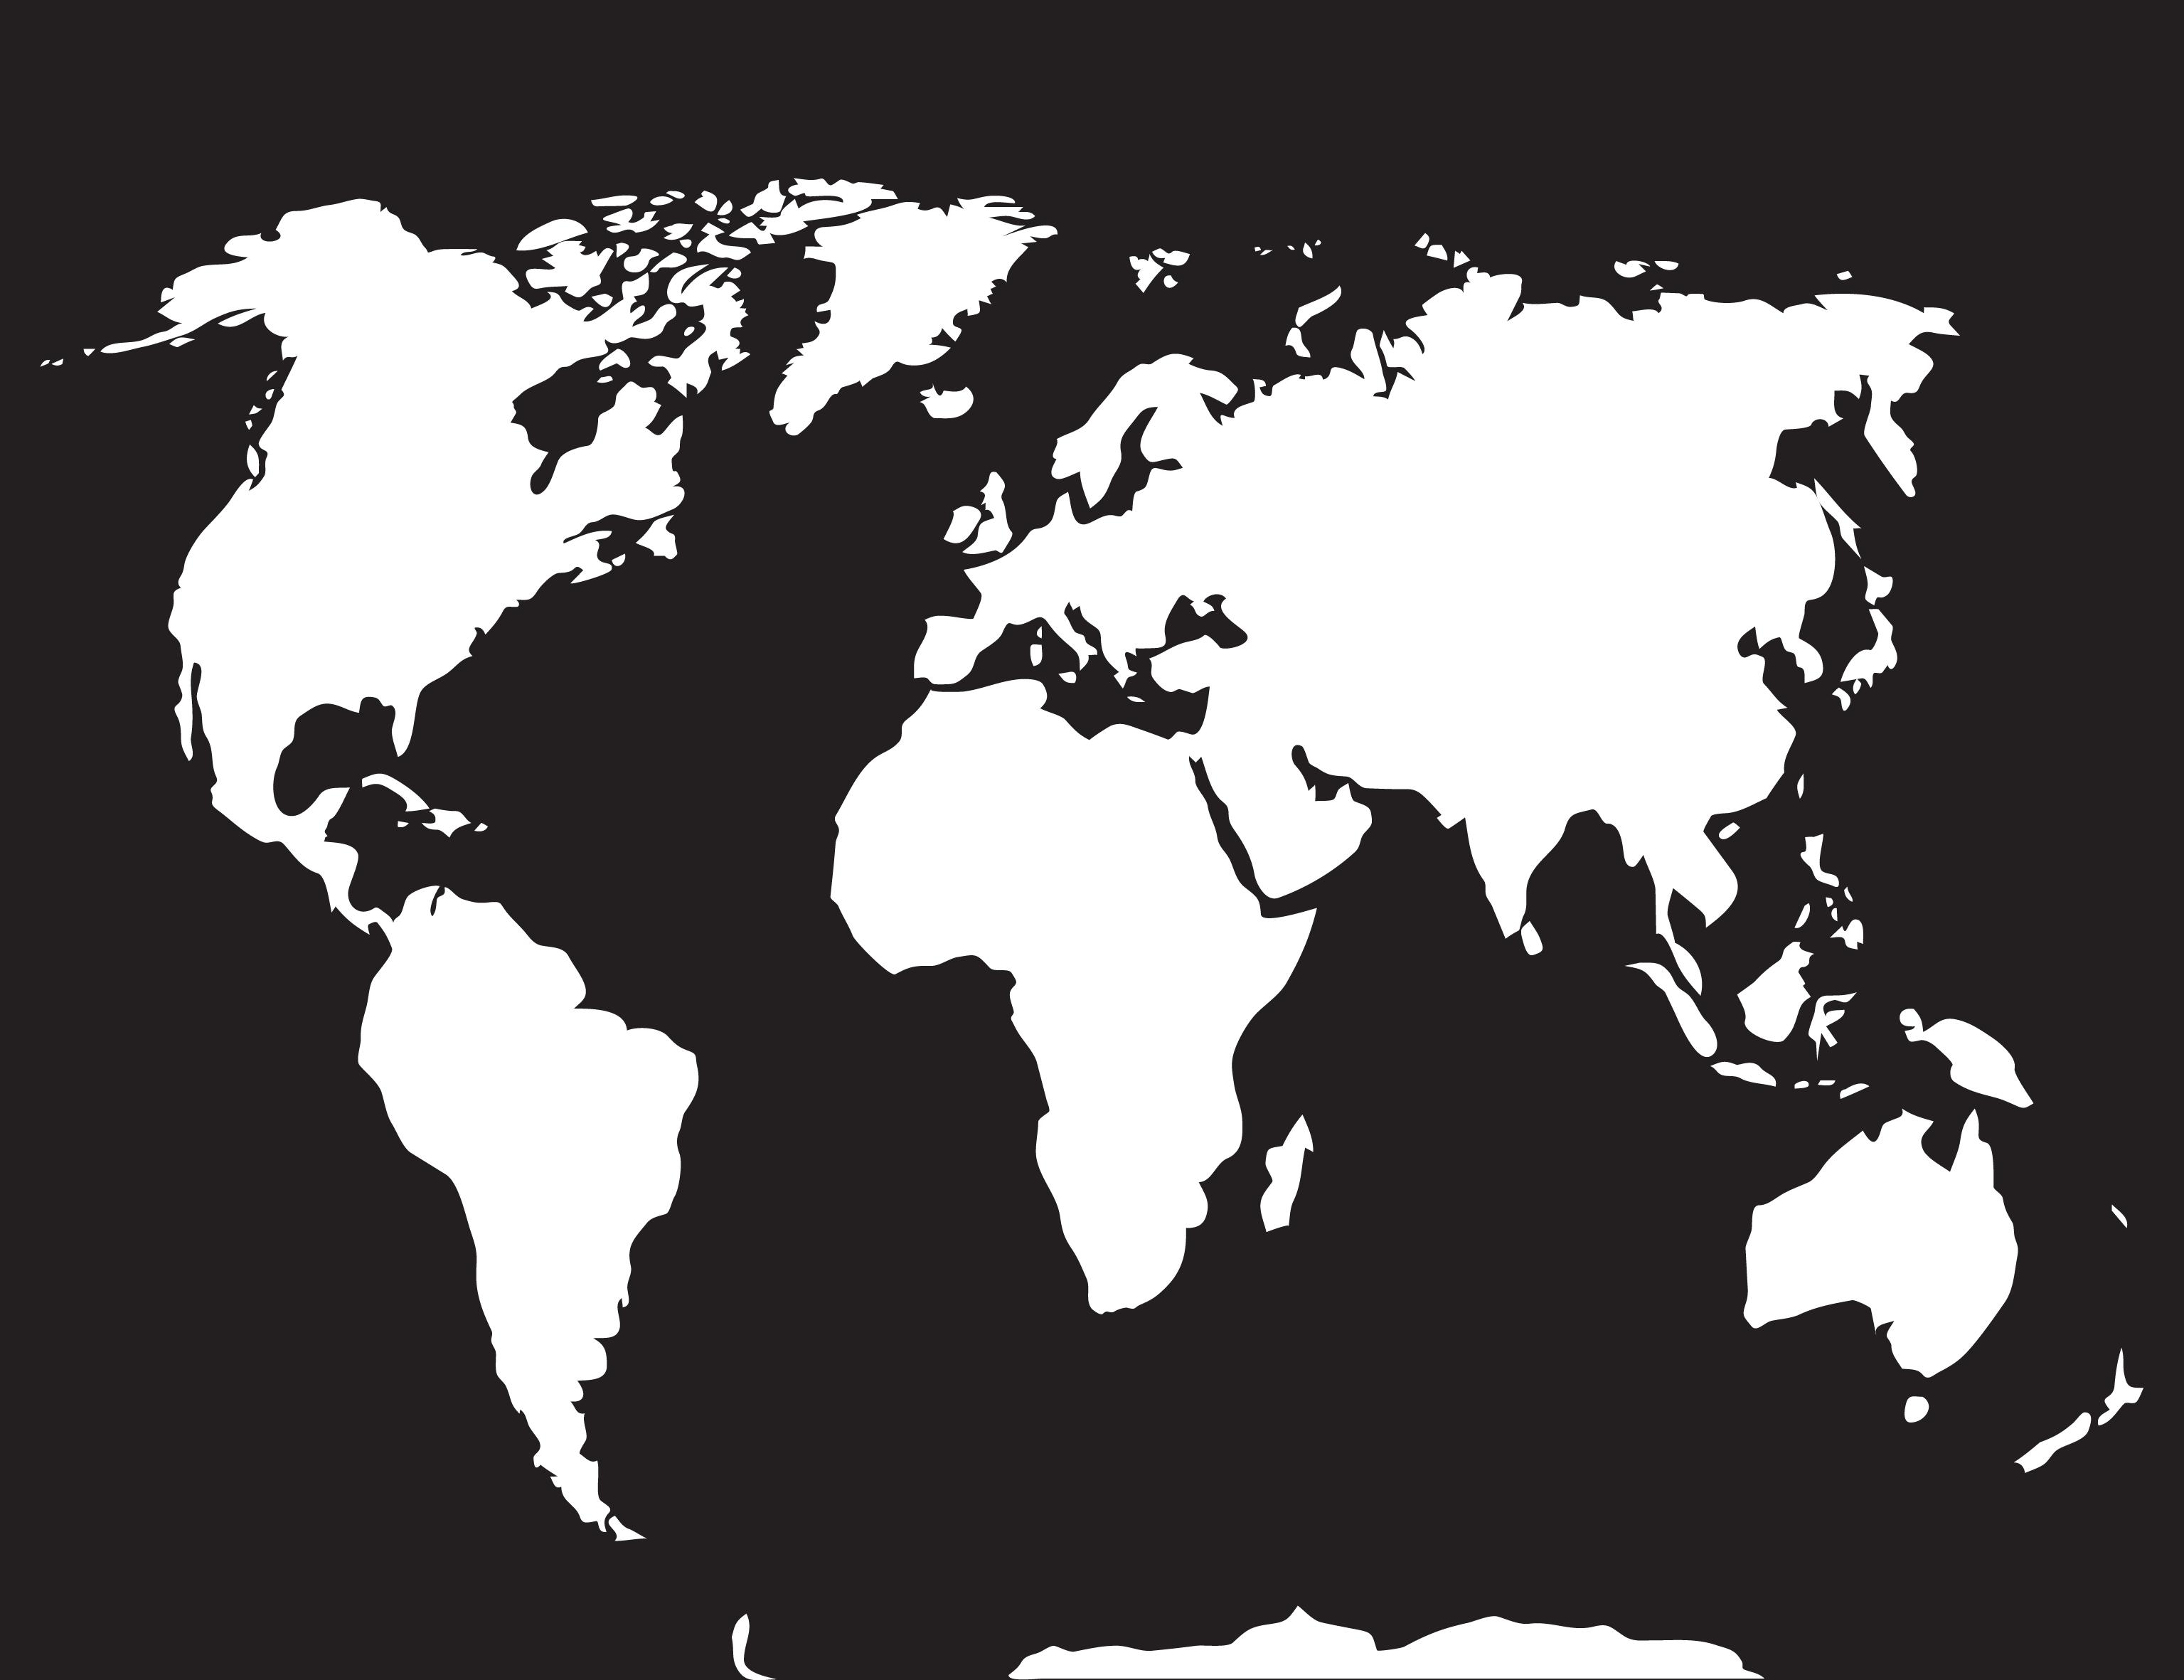 Map World Black White By 09910190 Thehungryjpeg Com